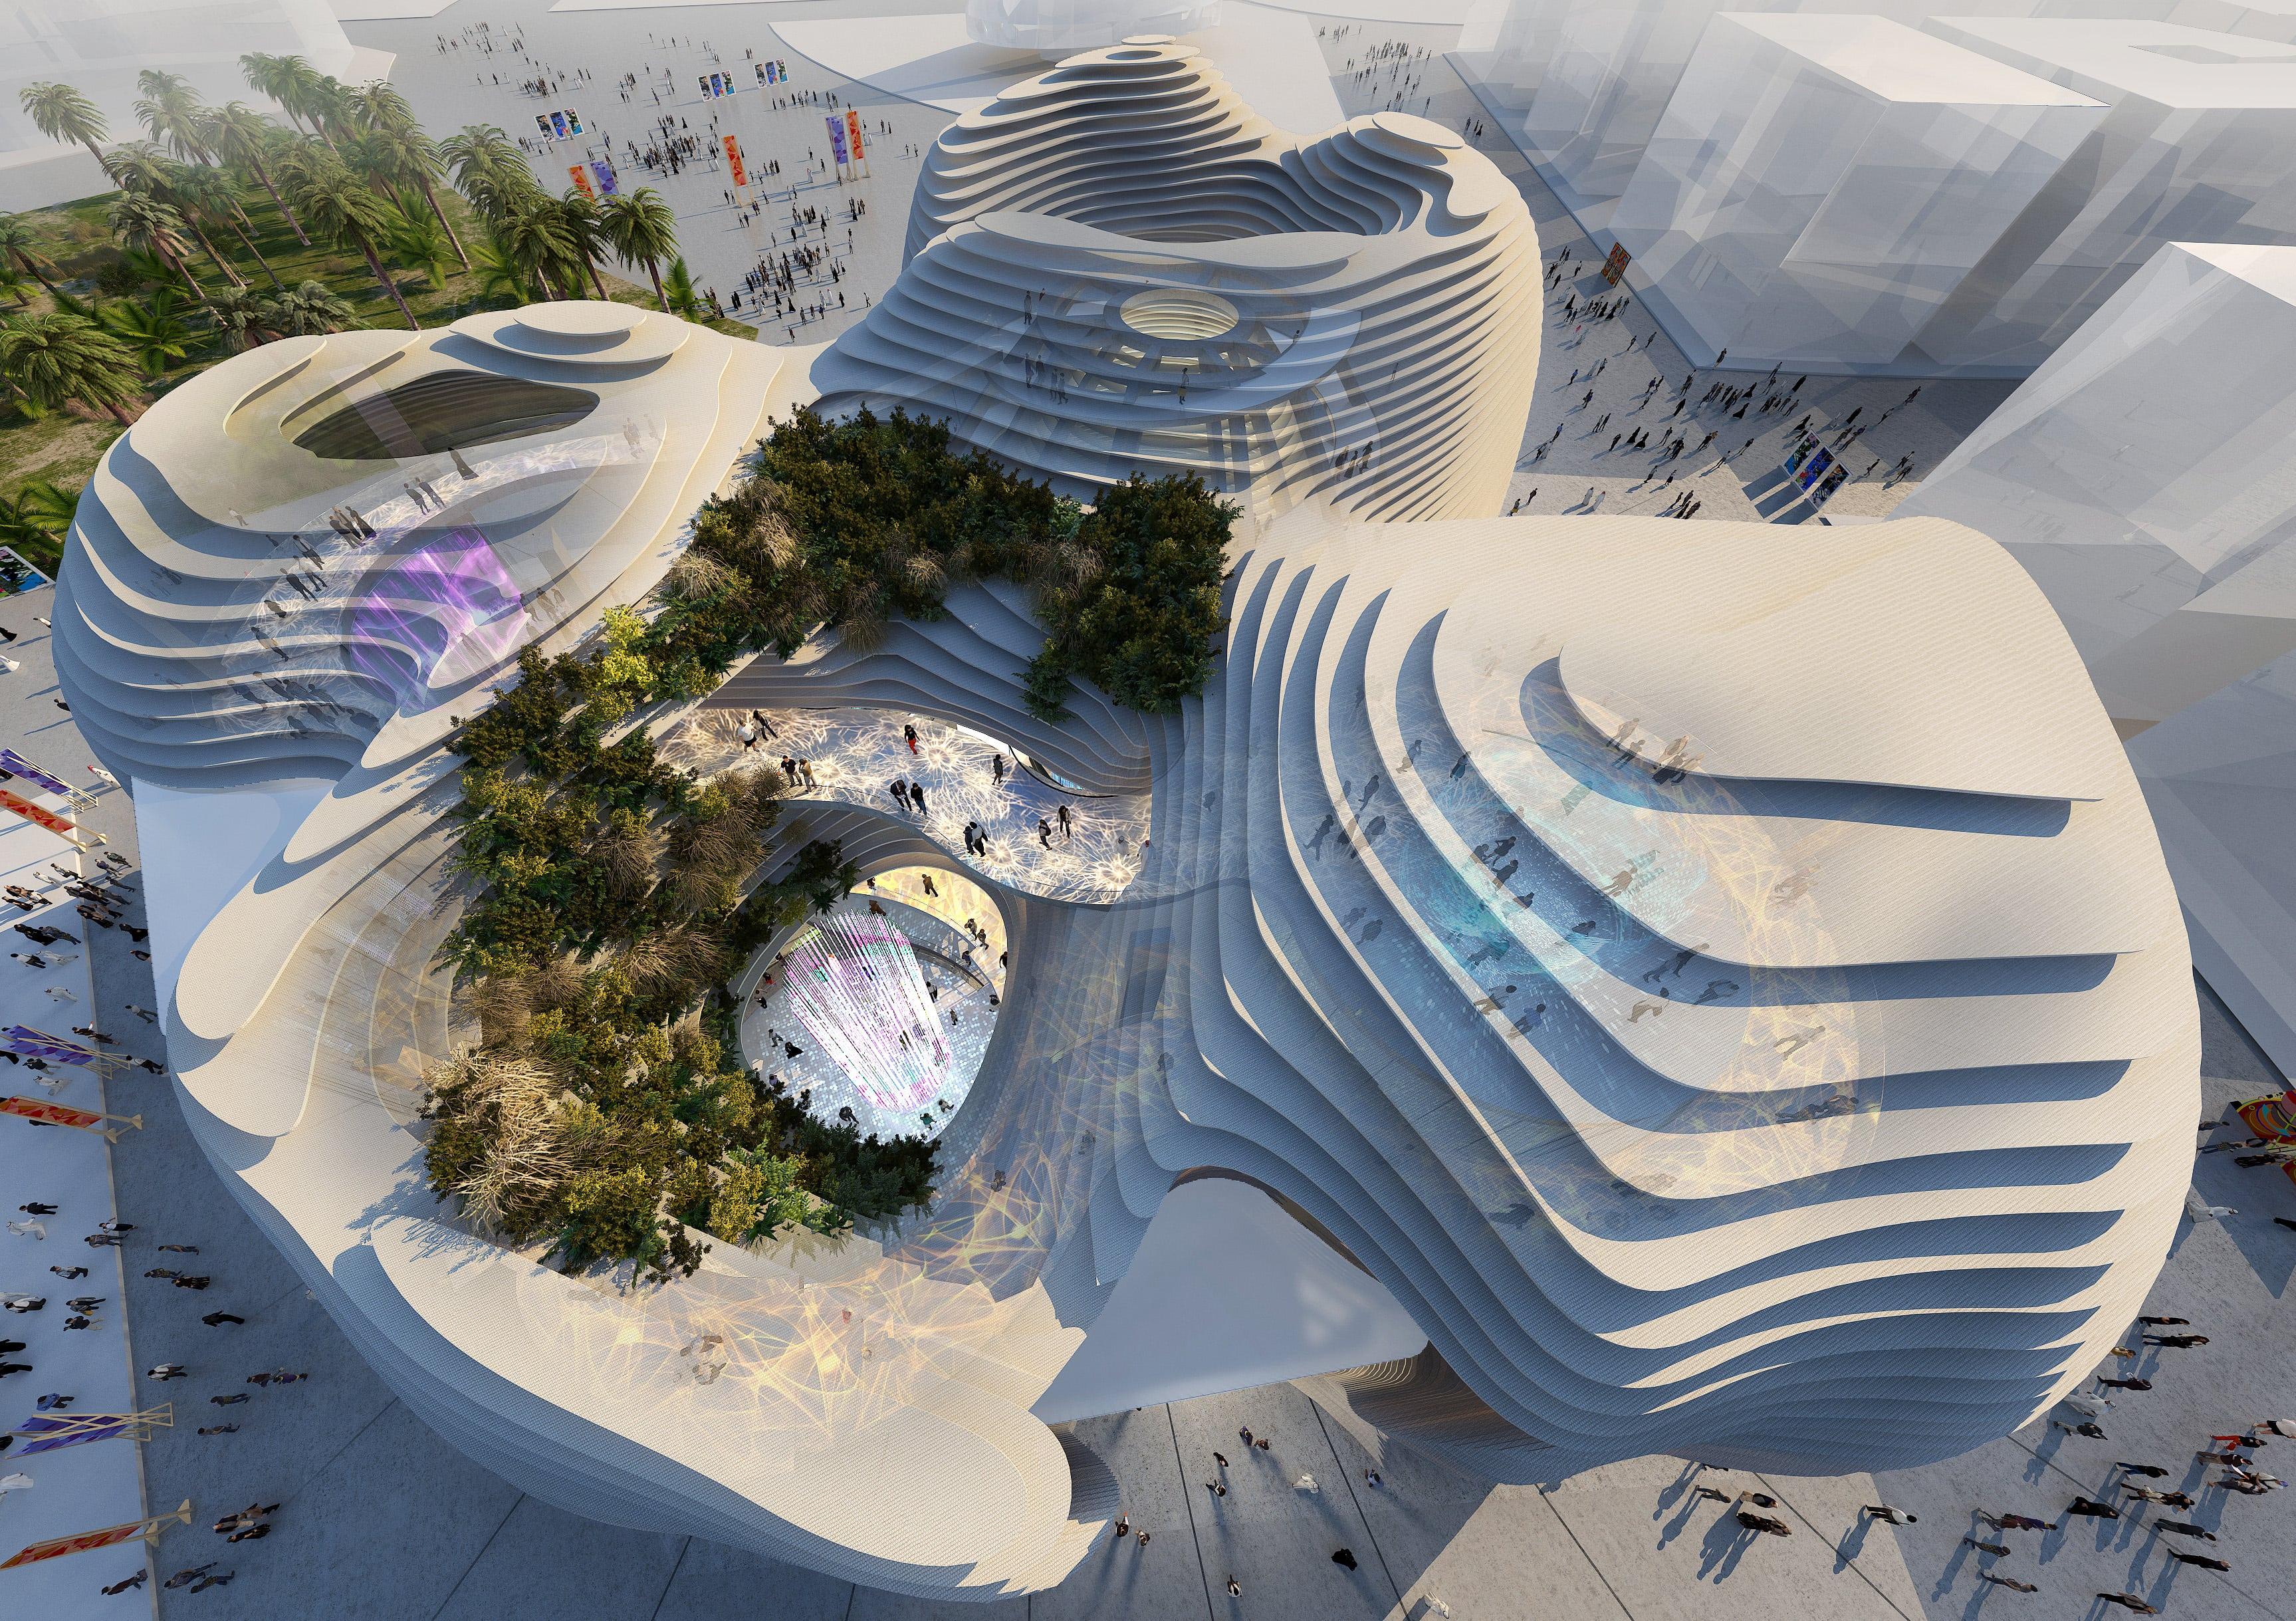 KSA Pavilion rendering image